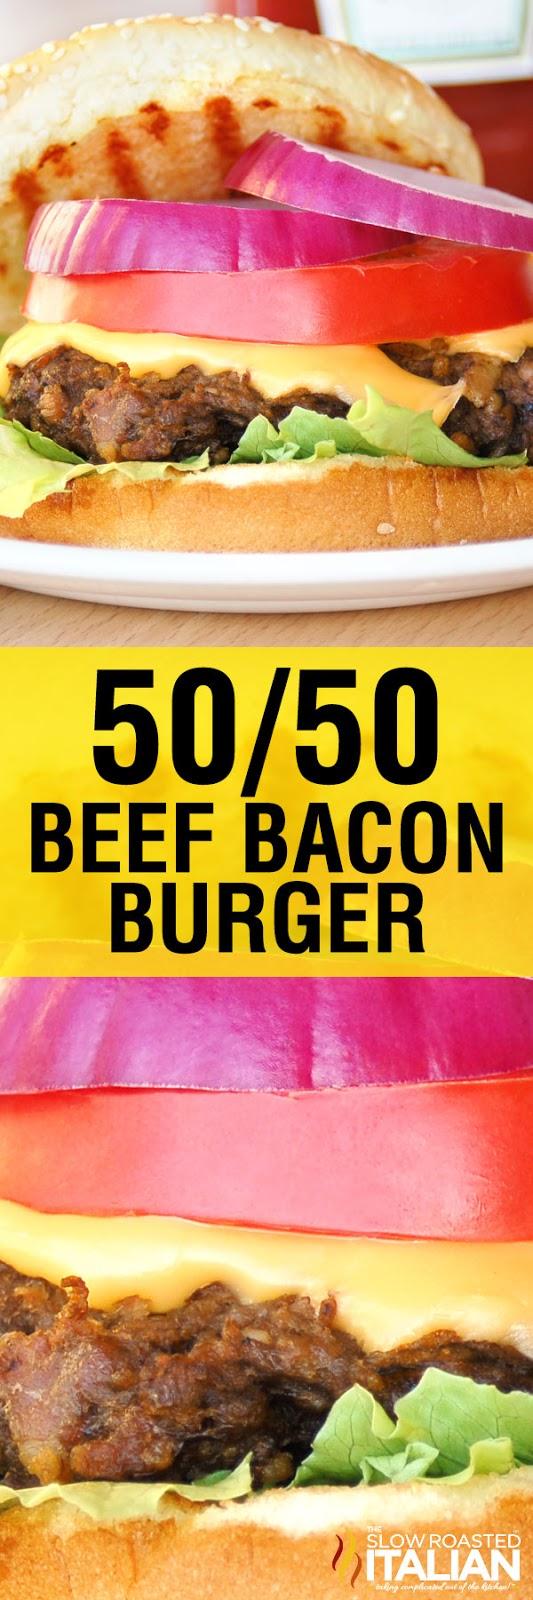 http://www.theslowroasteditalian.com/2011/09/5050-beef-bacon-burger.html